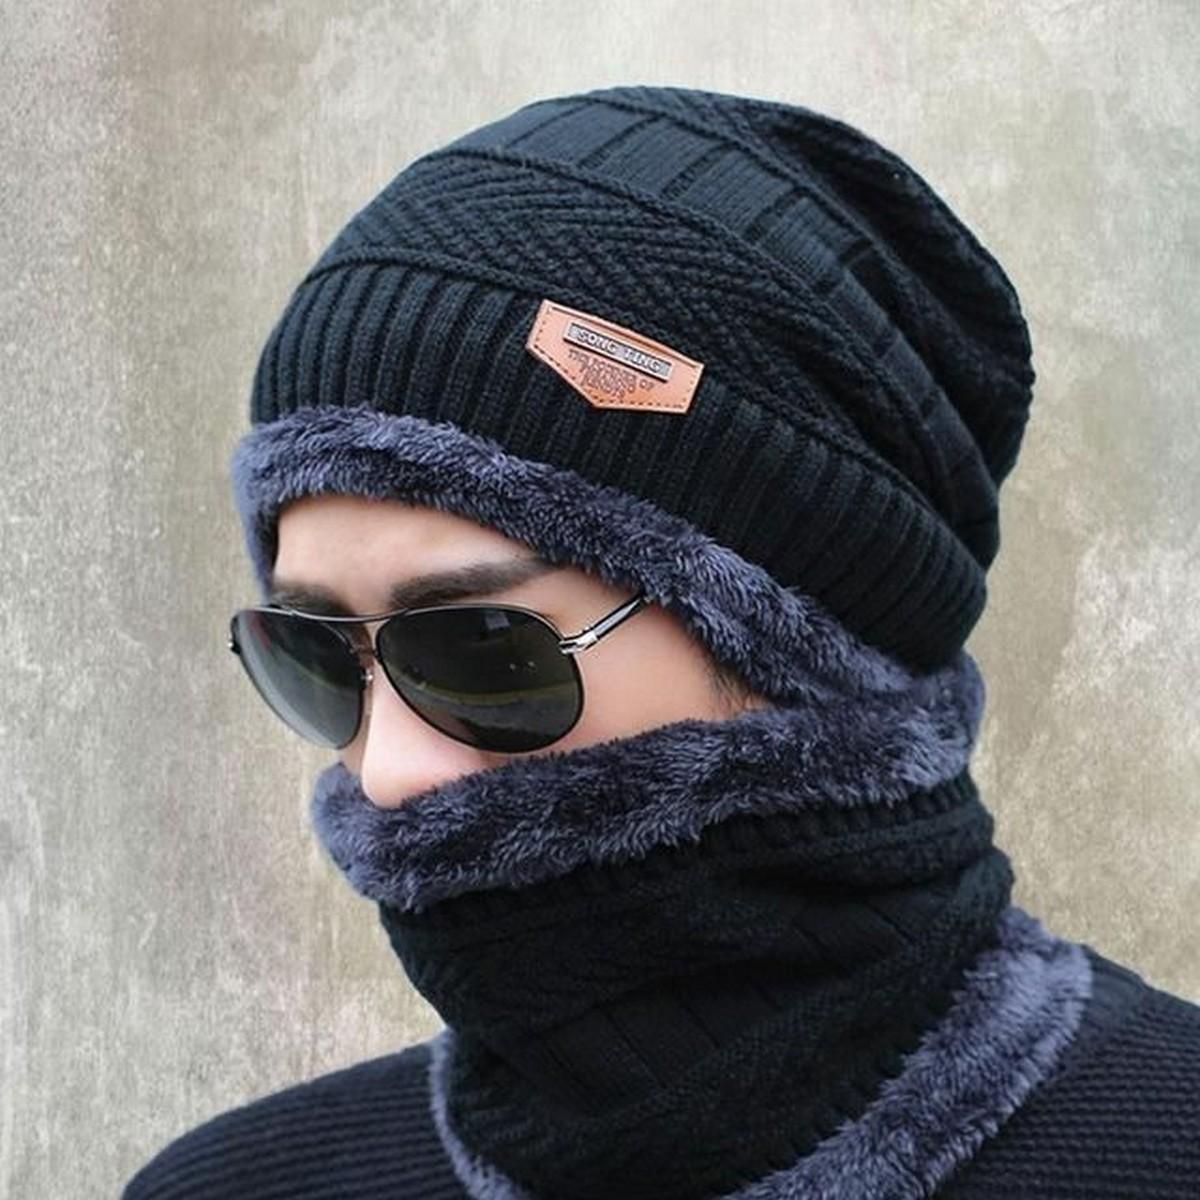 Winter Beanie Hat Cap Neck Warmer Scarf Set Fleece Lined Skull Cap and Scarf Unisex Hat & Scarf Set Stylish Knit Skull Cap for Men Women